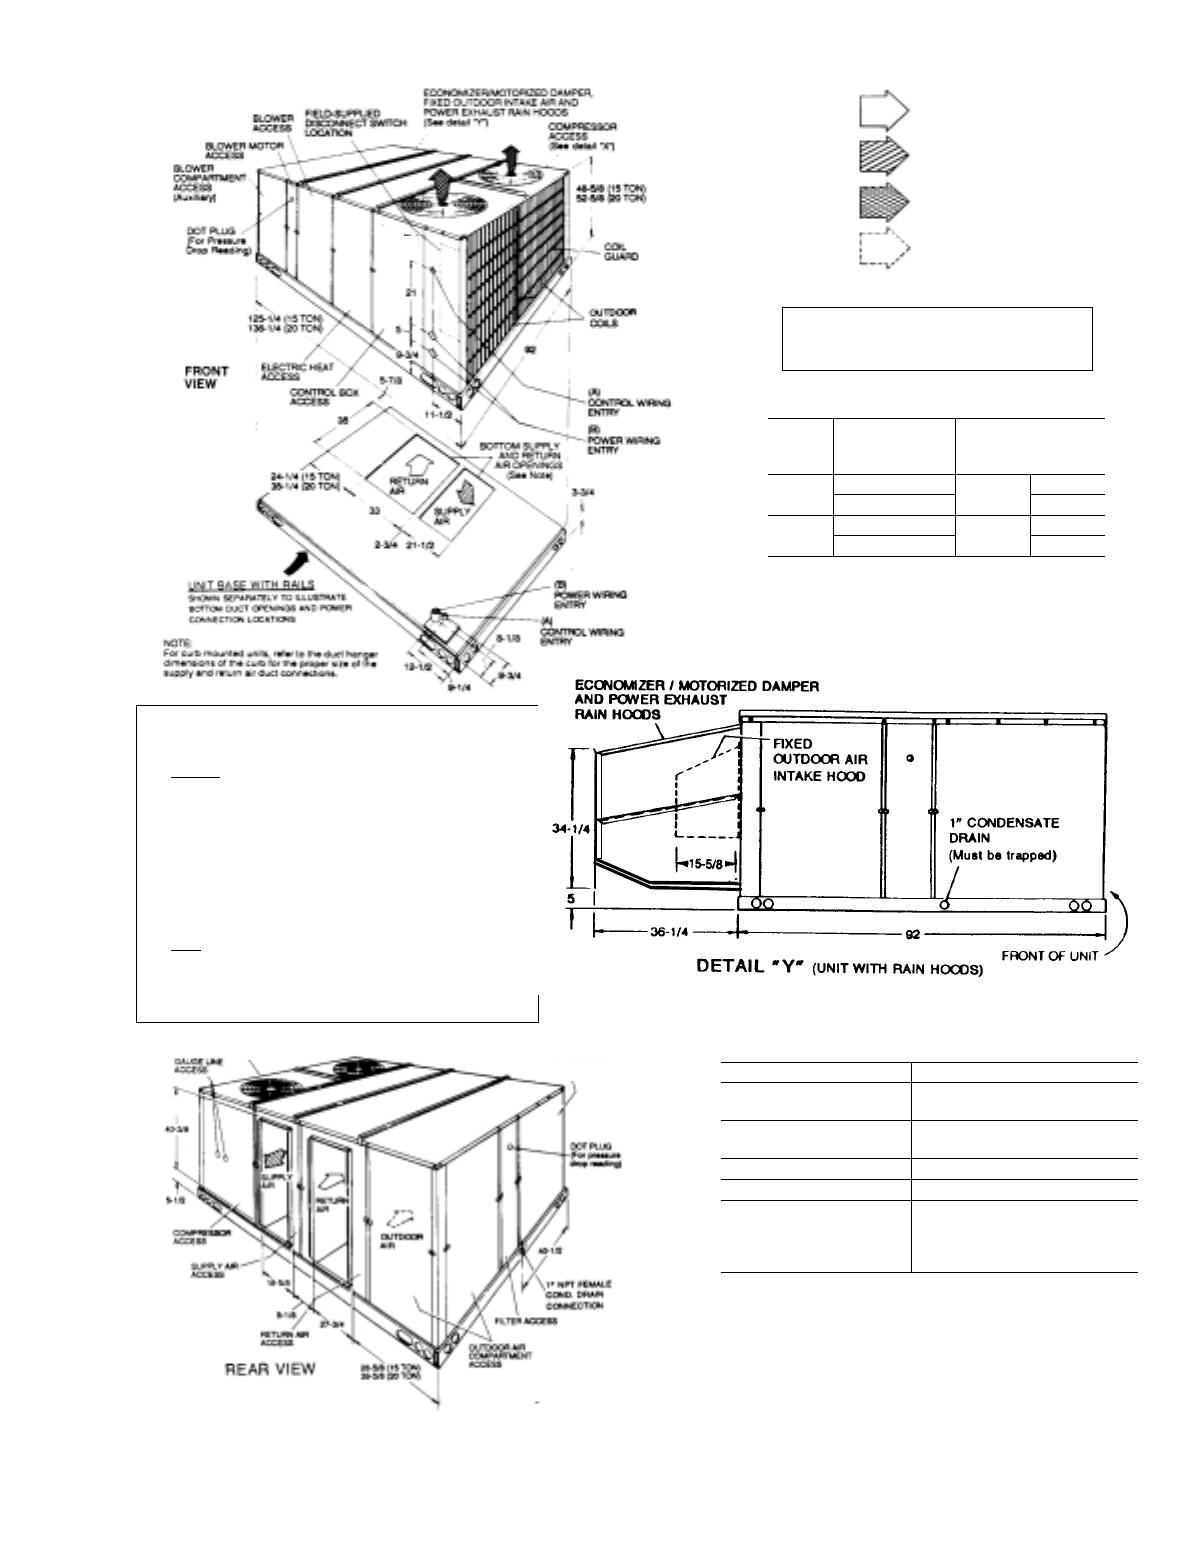 honeywell rth221b1000 wiring diagram upper arm muscles rth6450 rth221b